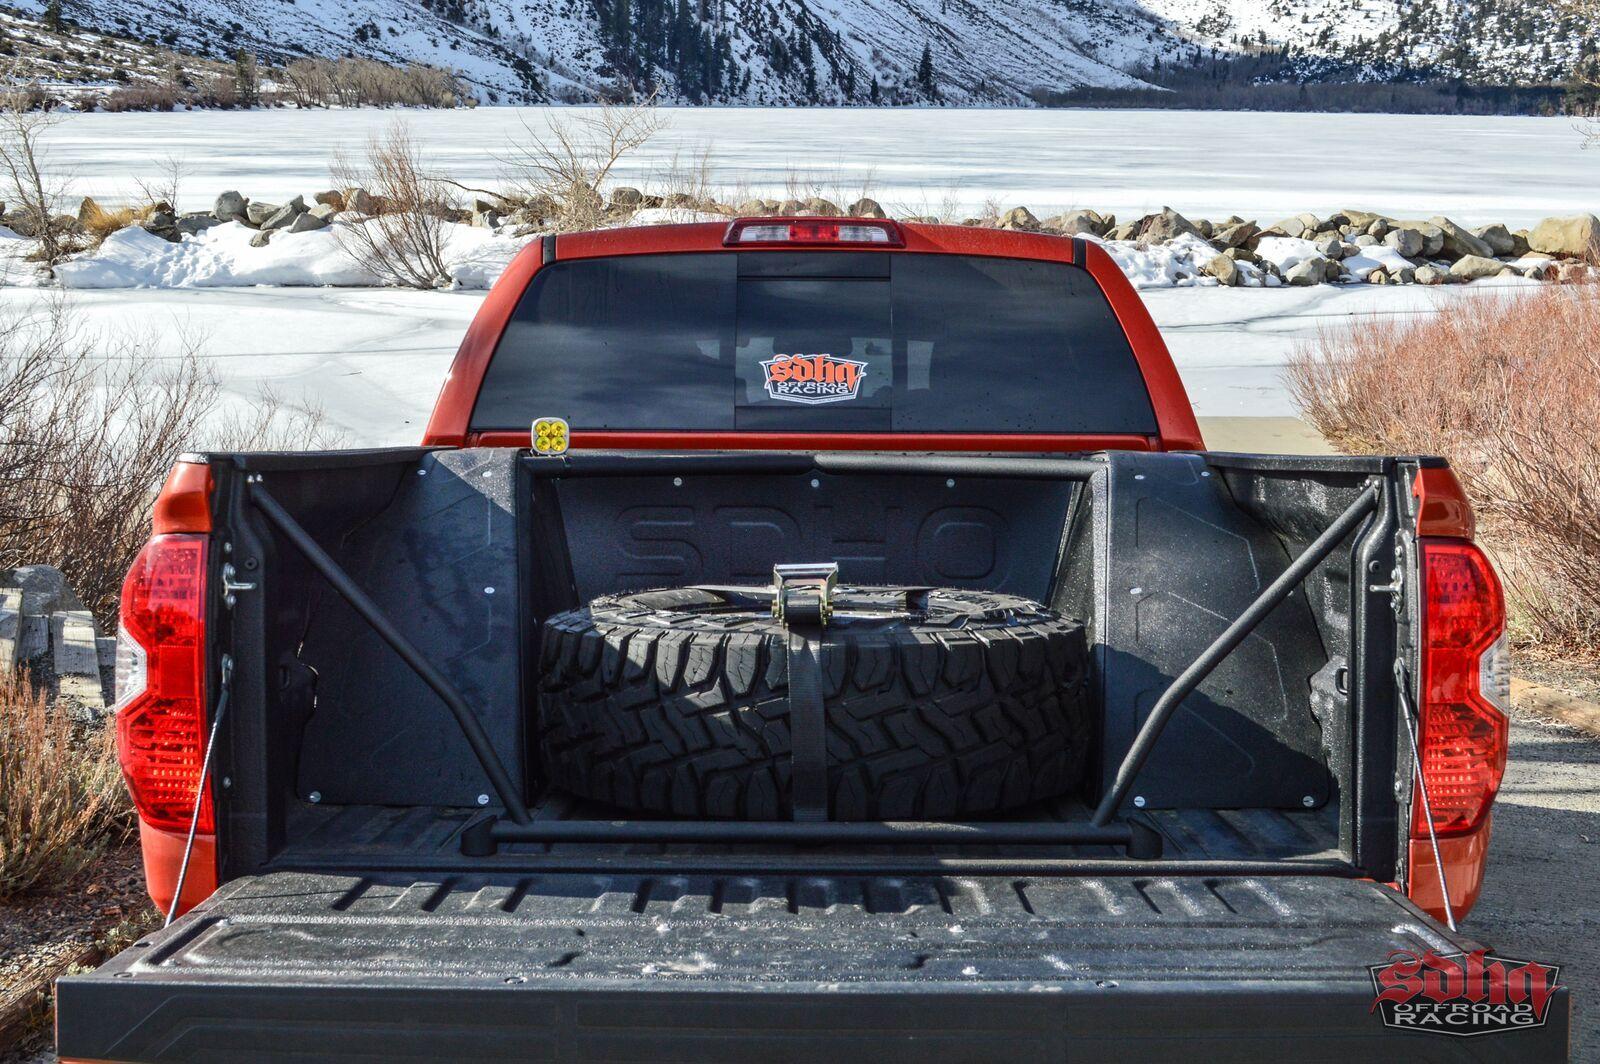 SDHQ Tundra TRD Pro Tundra trd, Tundra trd pro, Tire icon